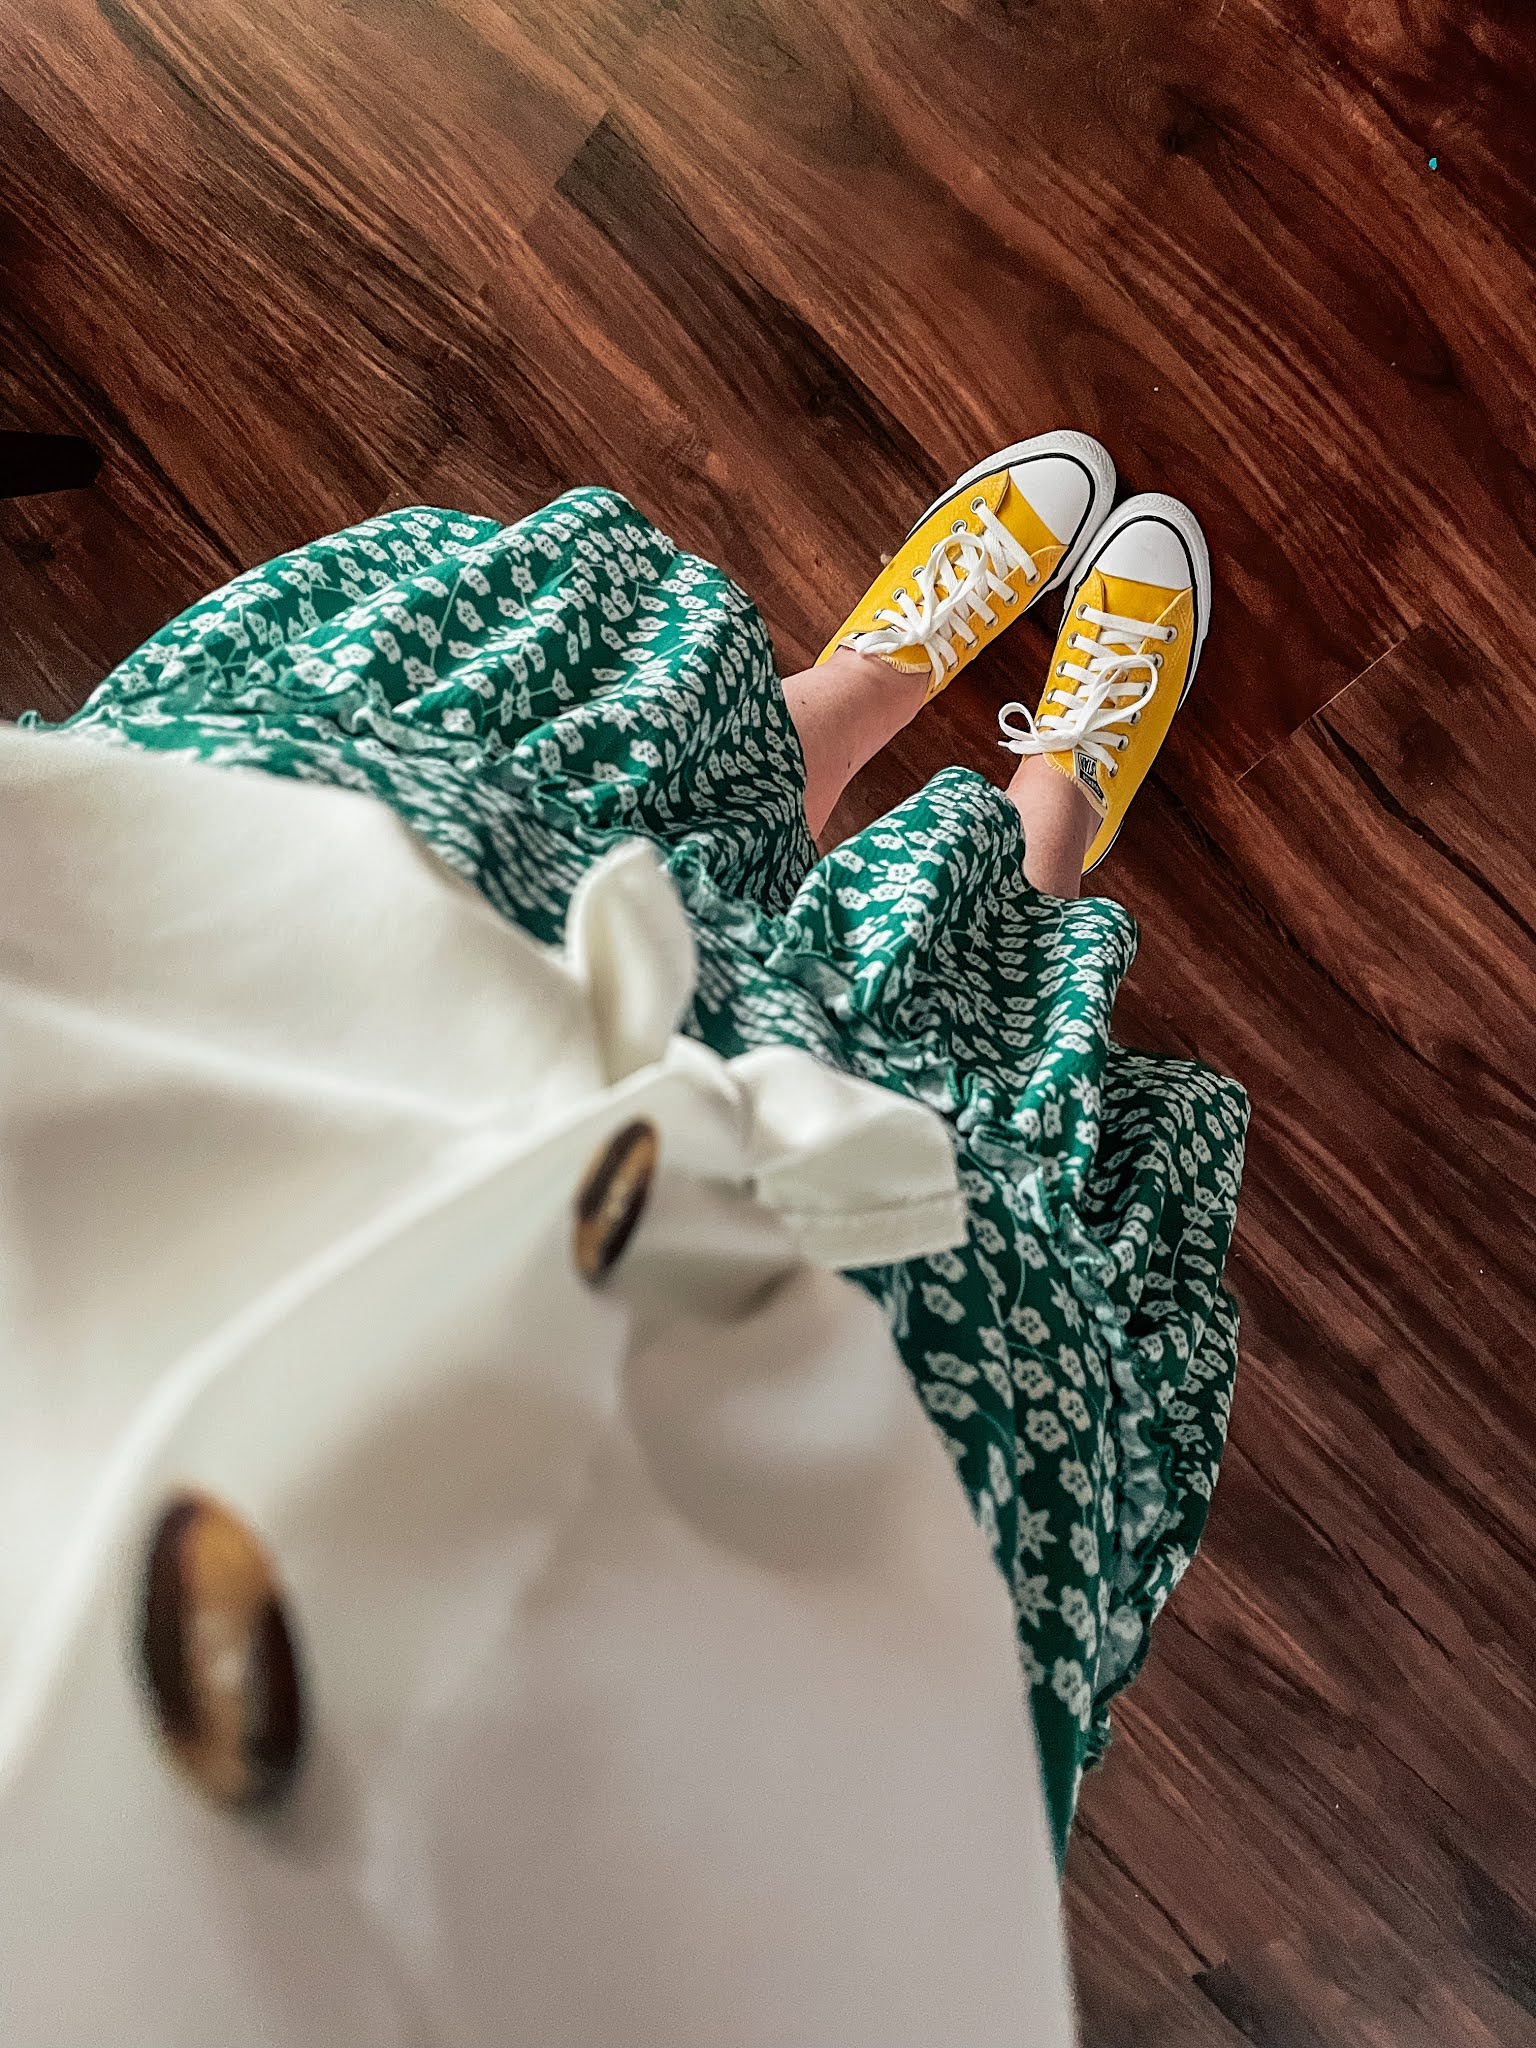 green-floral-skirt-yellow-converse